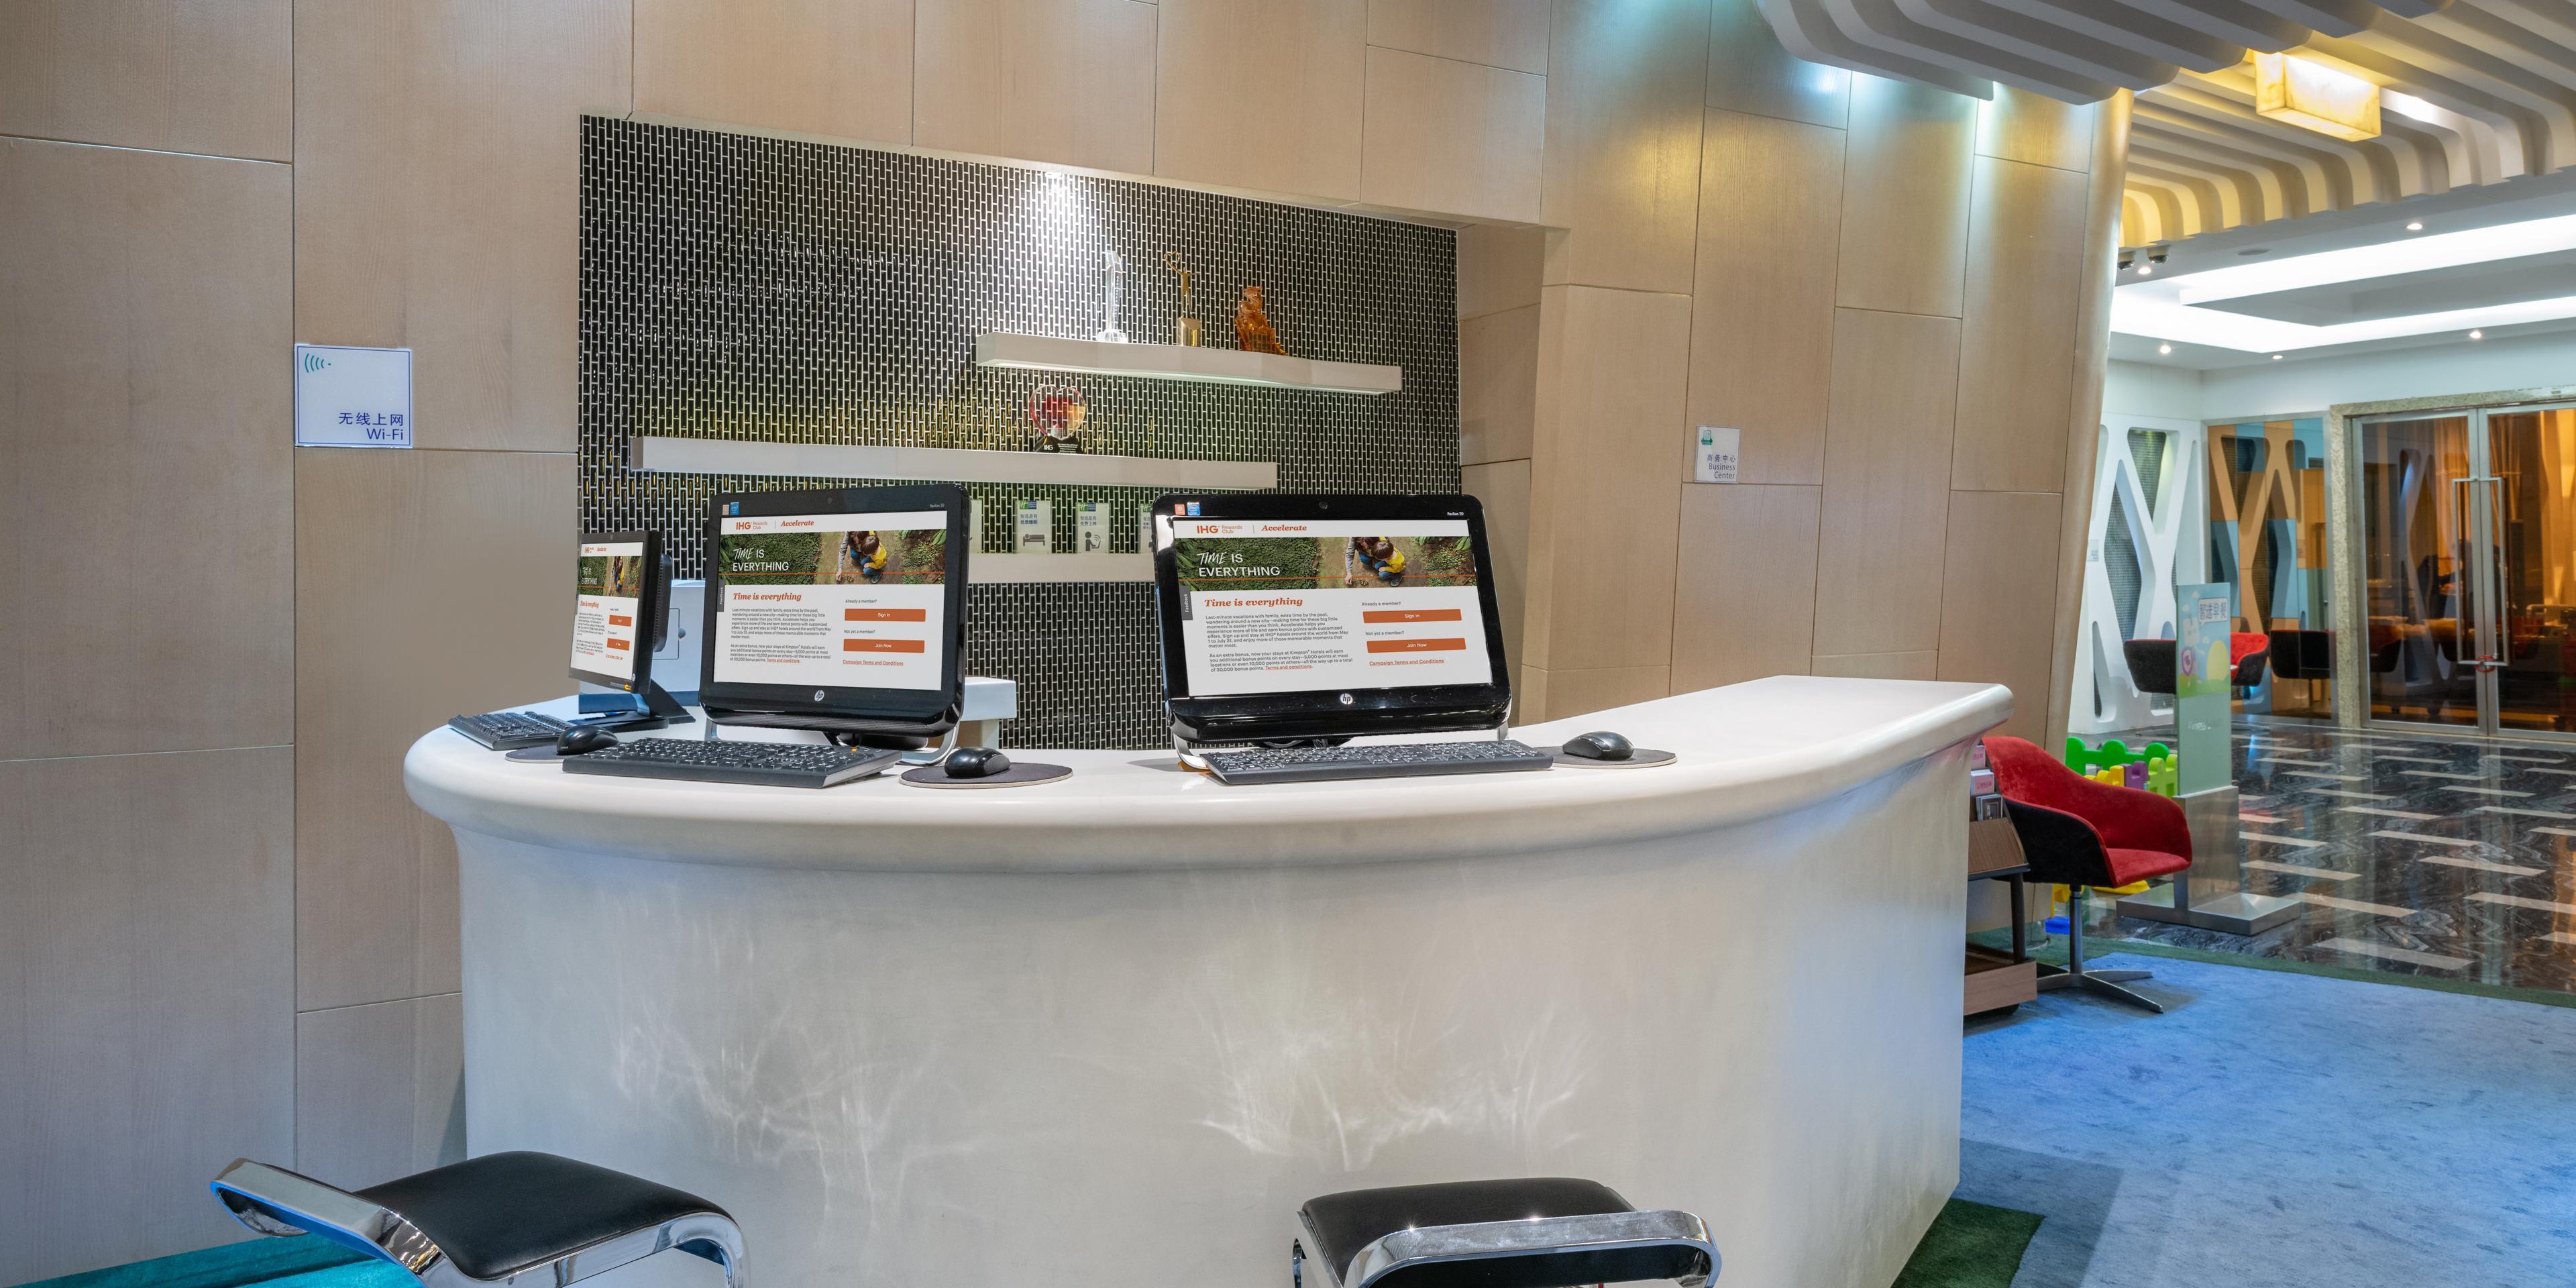 Holiday Inn Express Shanghai New Hongqiao Hotel by IHG 23a064422